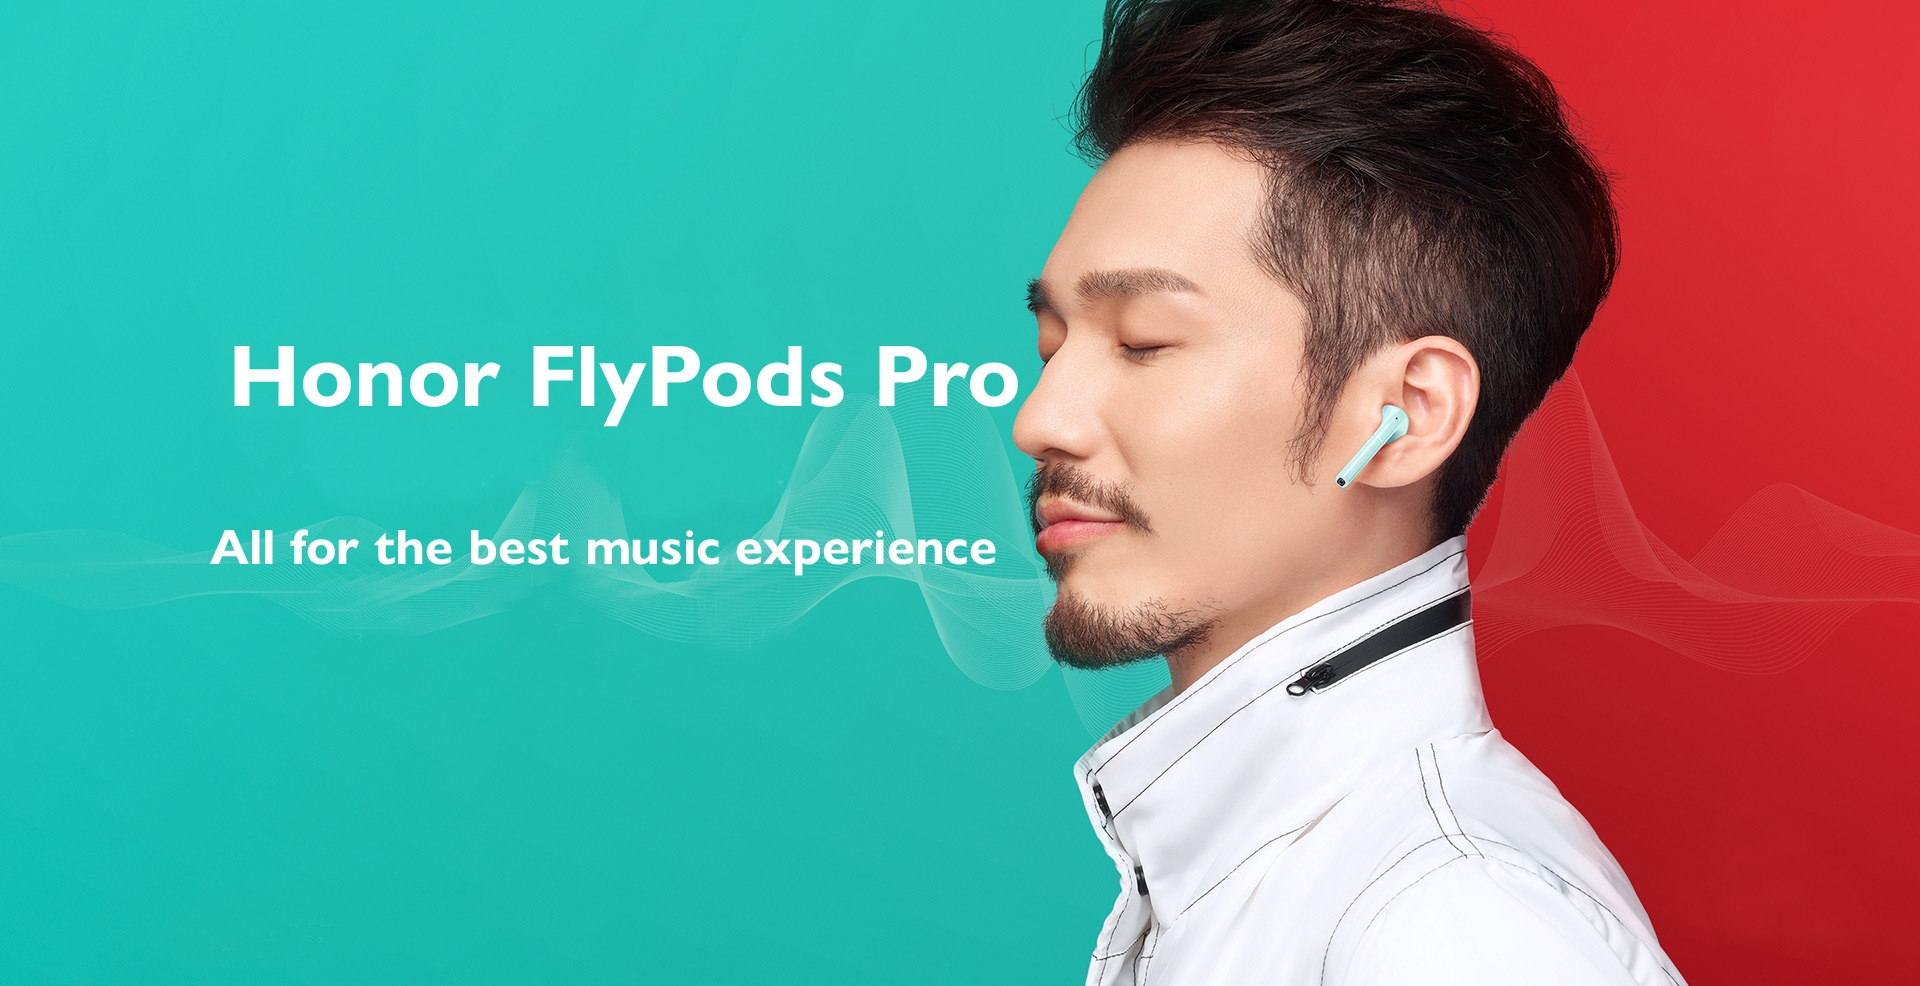 Honor FlyPods Pro